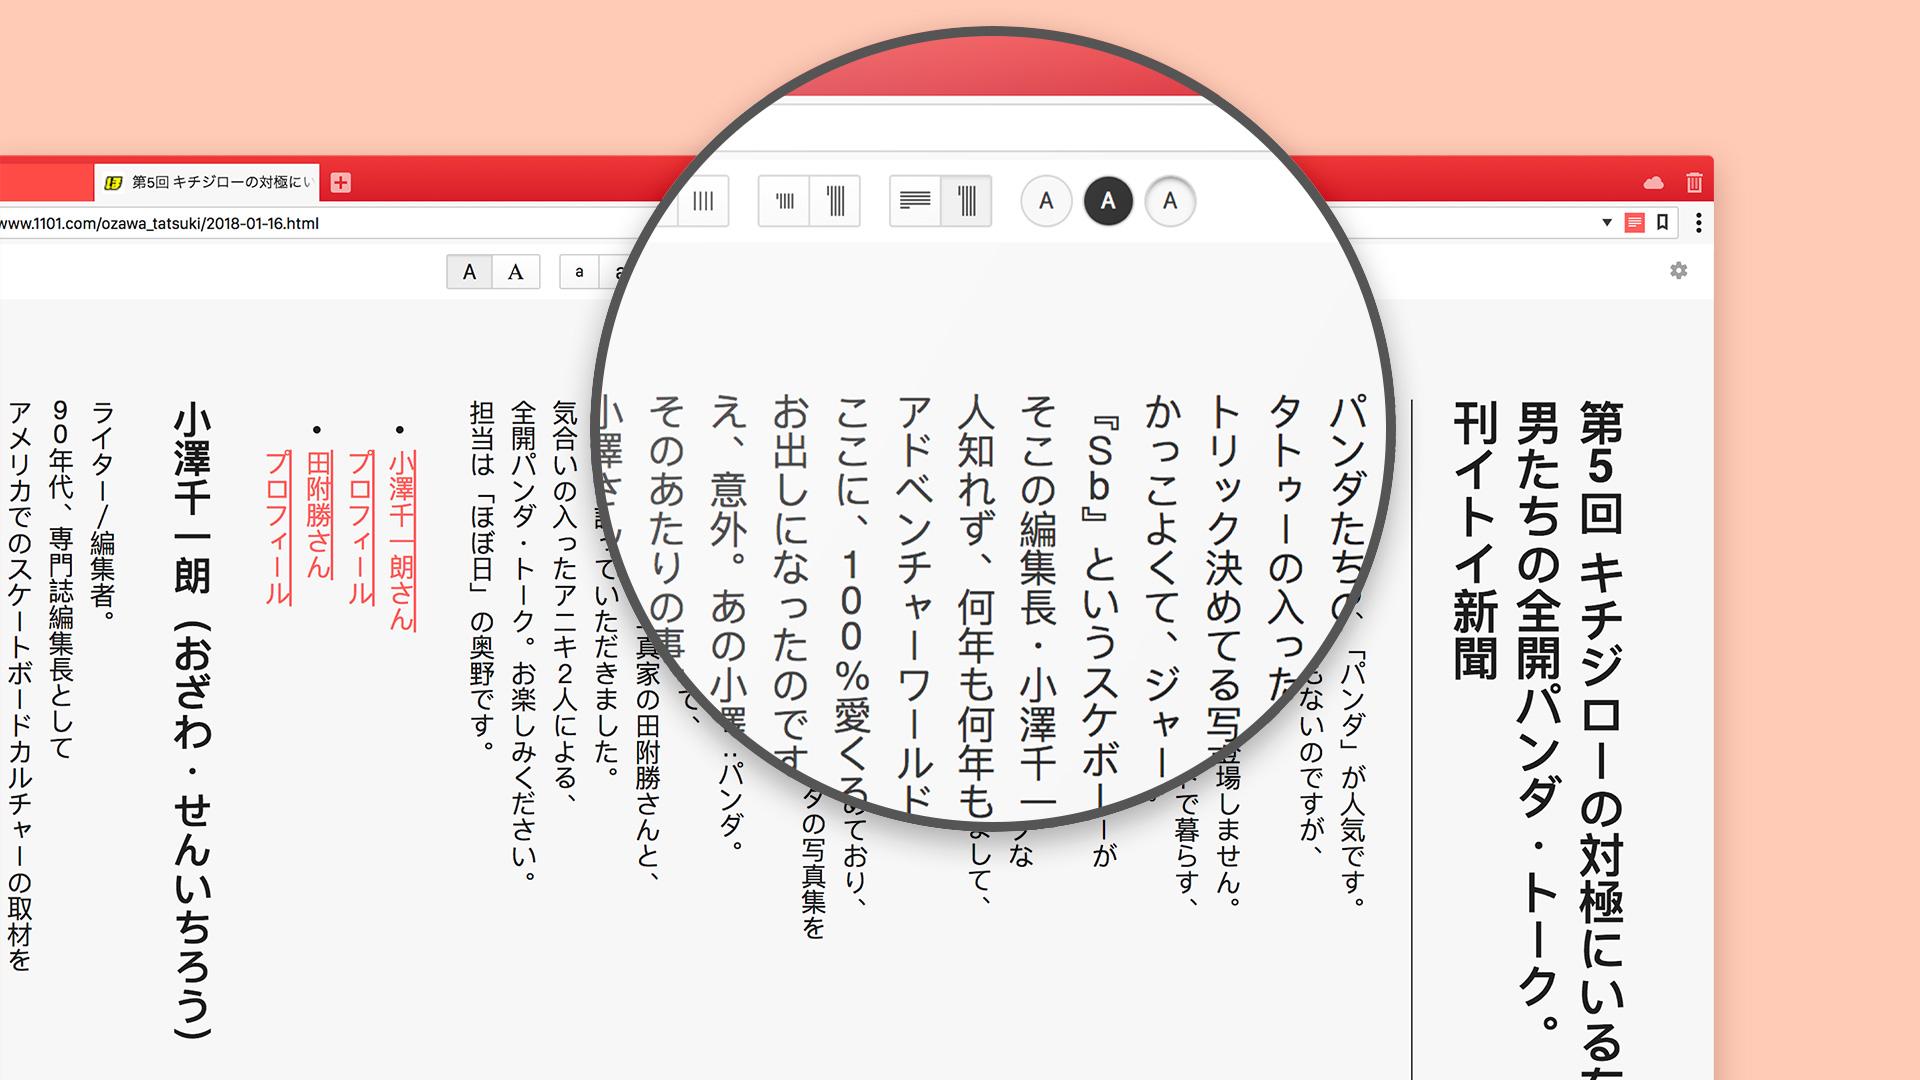 Vertical Reader Mode   Snapshot   Vivaldi Browser